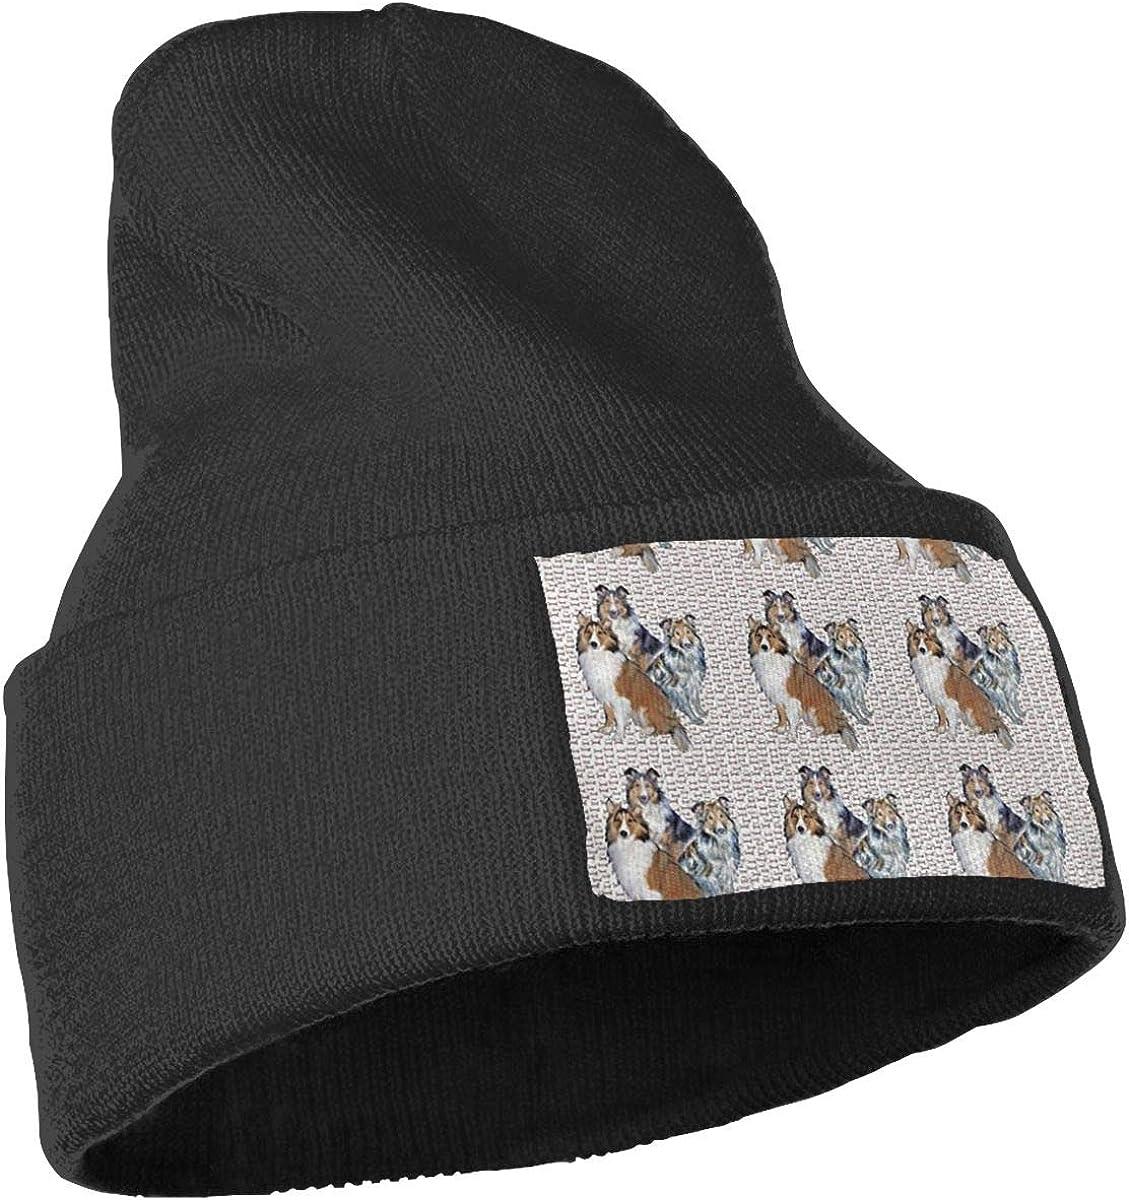 Xugui Shelties and Bones Beanie Hat Unisex Soft Warm Cap Cycling Skull Hats